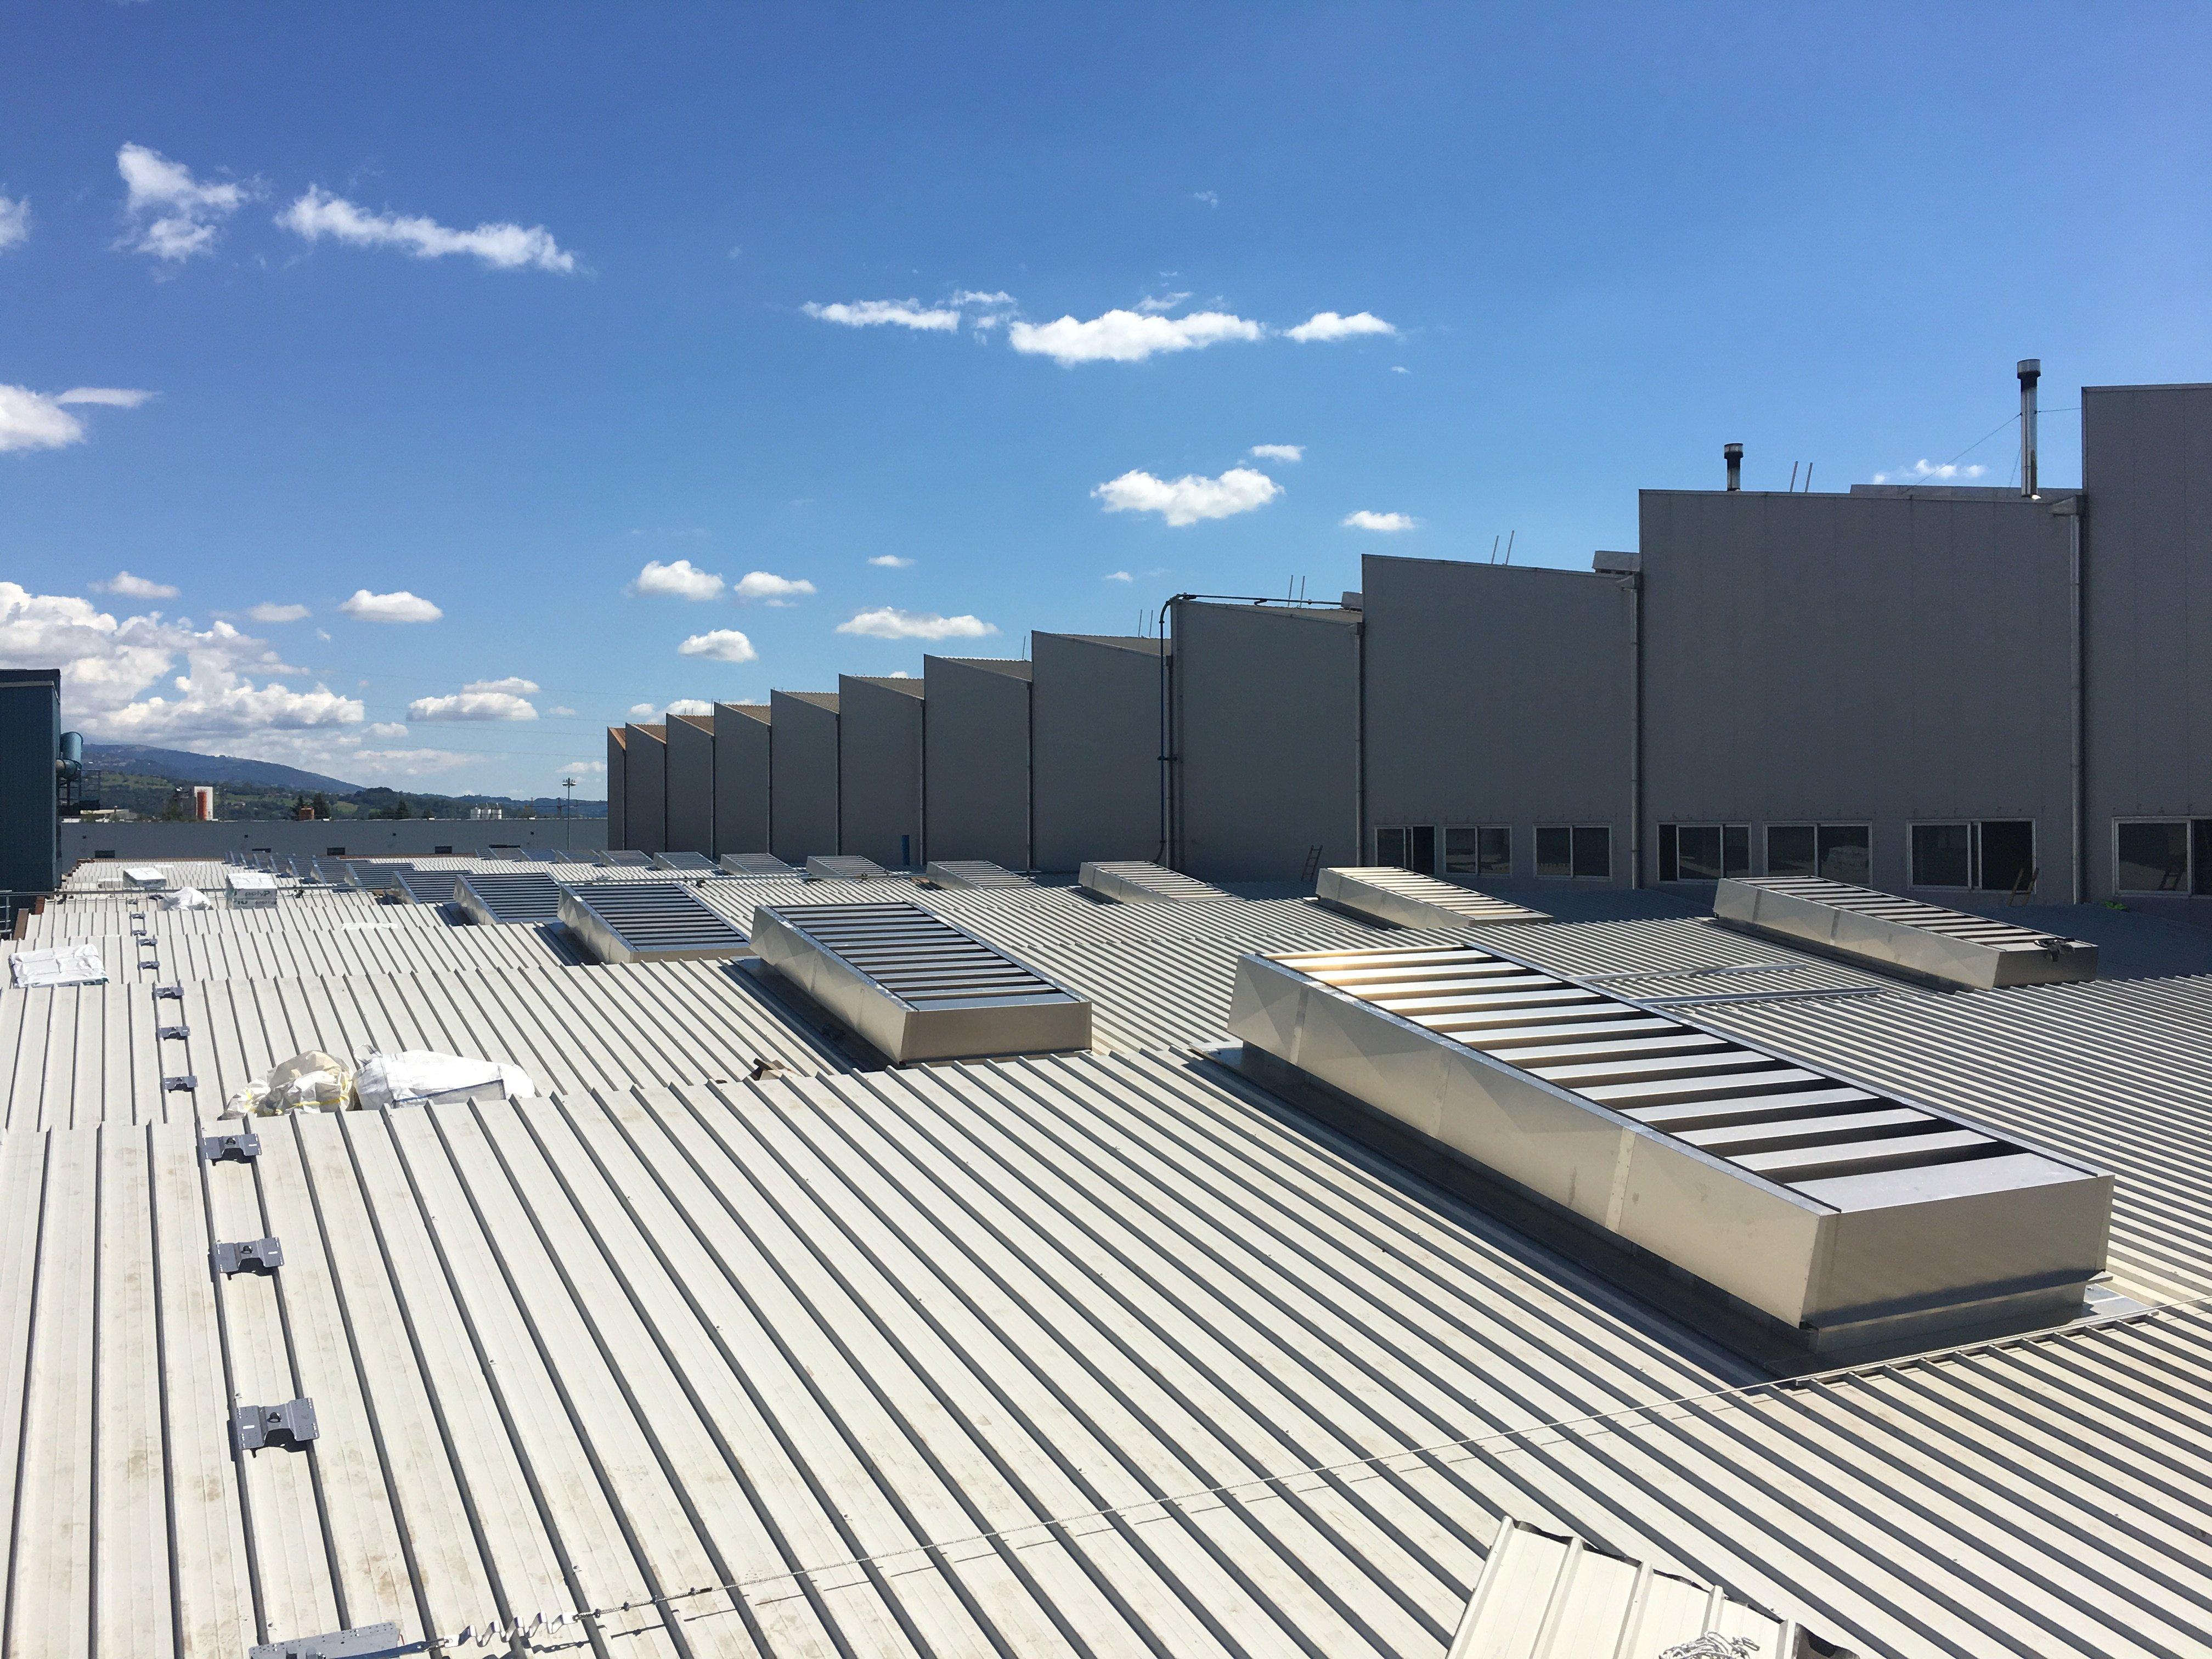 copertura industriale e prese d'aria